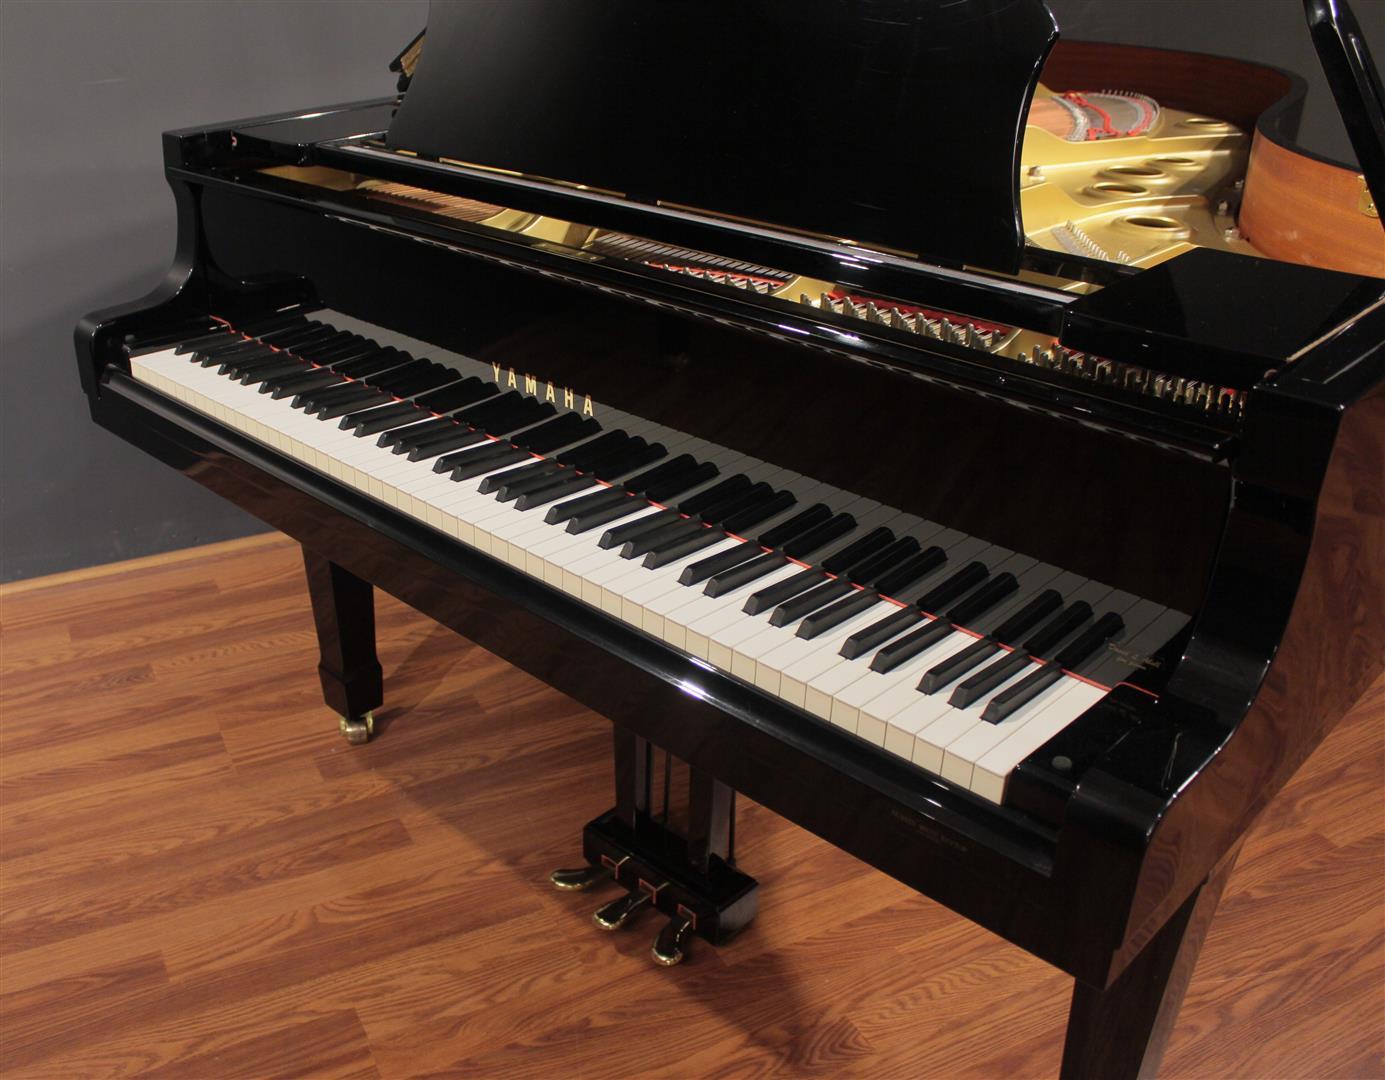 Yamaha disklavier dc5 6 39 7 39 39 grand piano polished ebony ebay for Yamaha disklavier grand piano